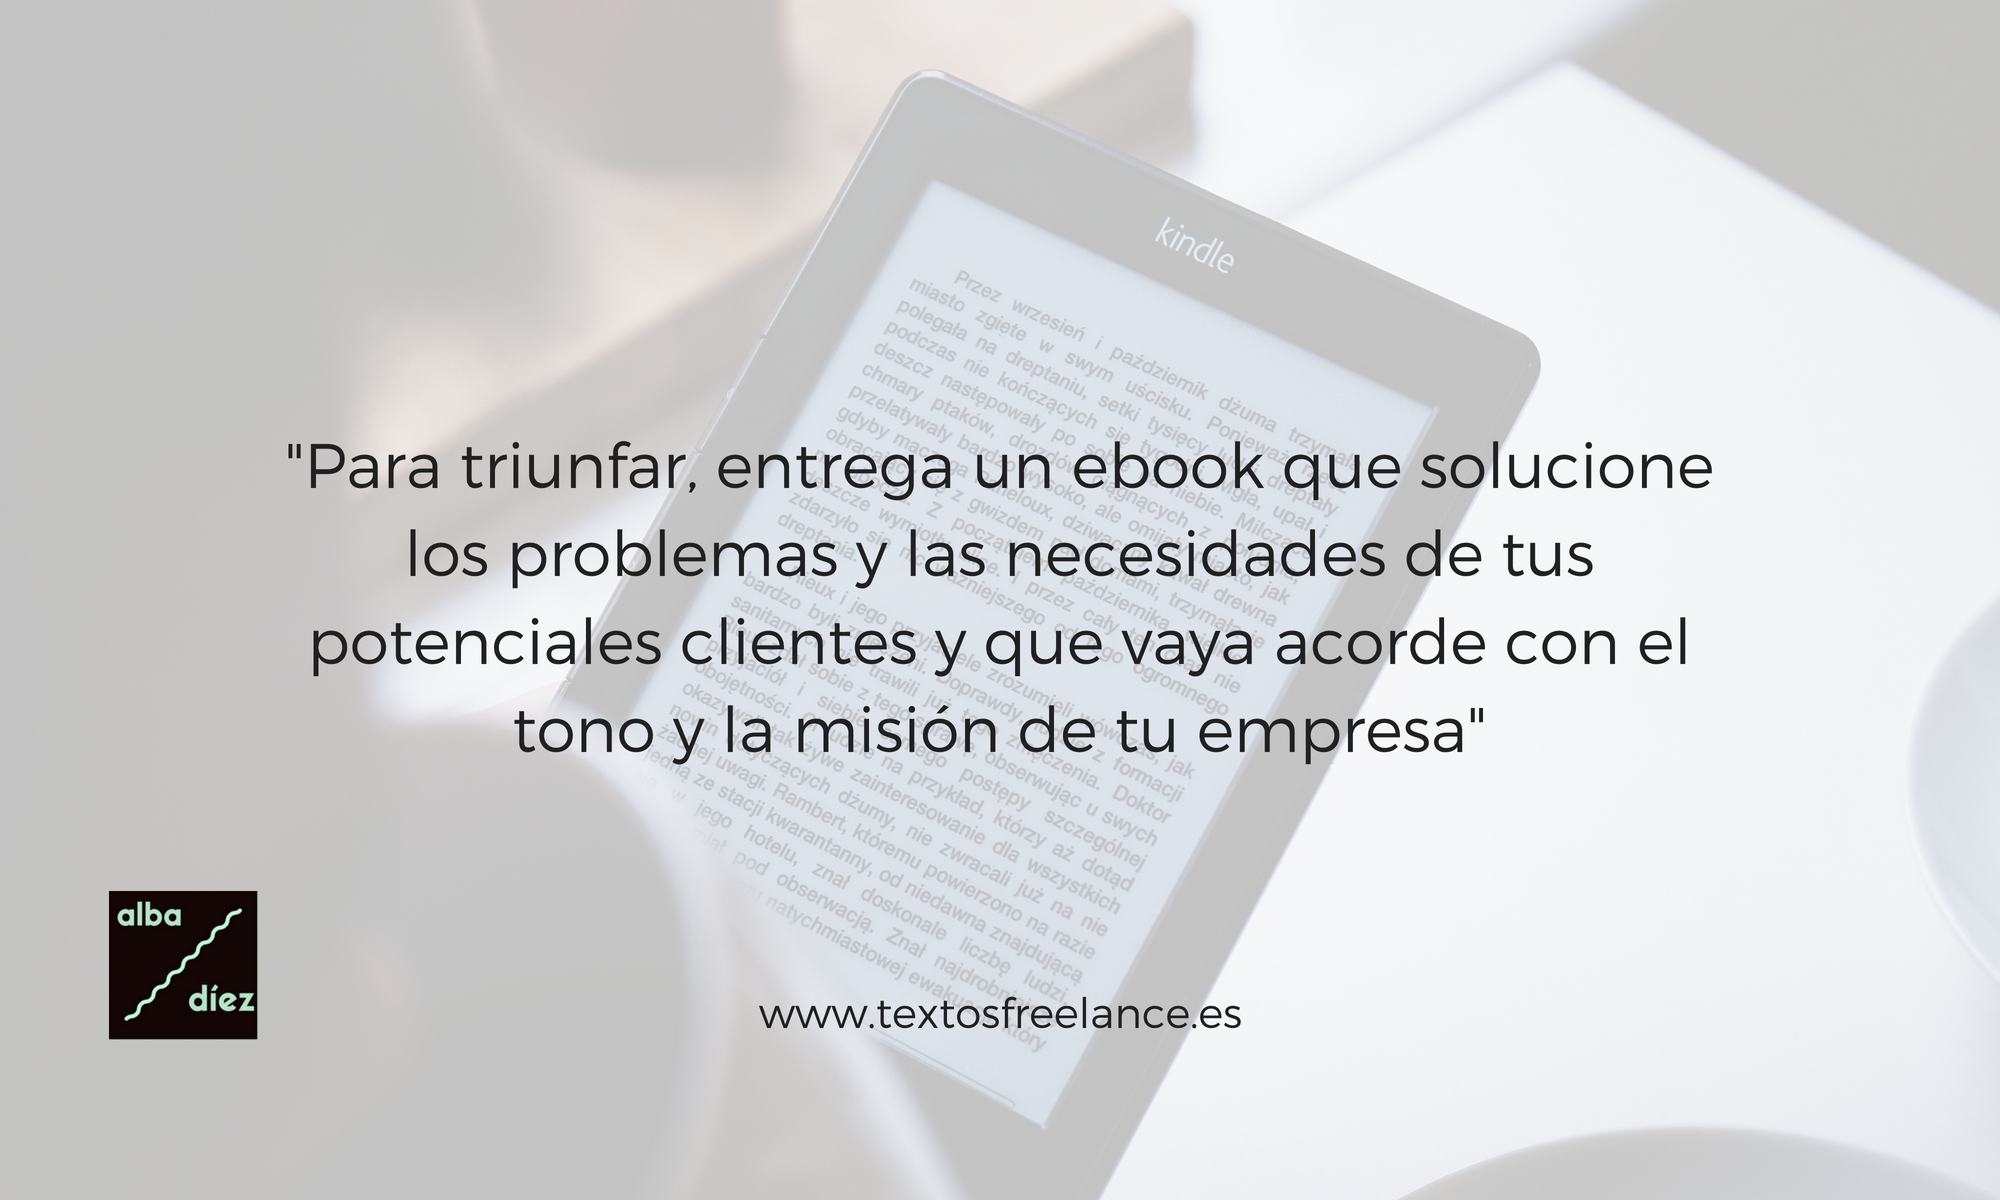 redactor ebooks textos freelance